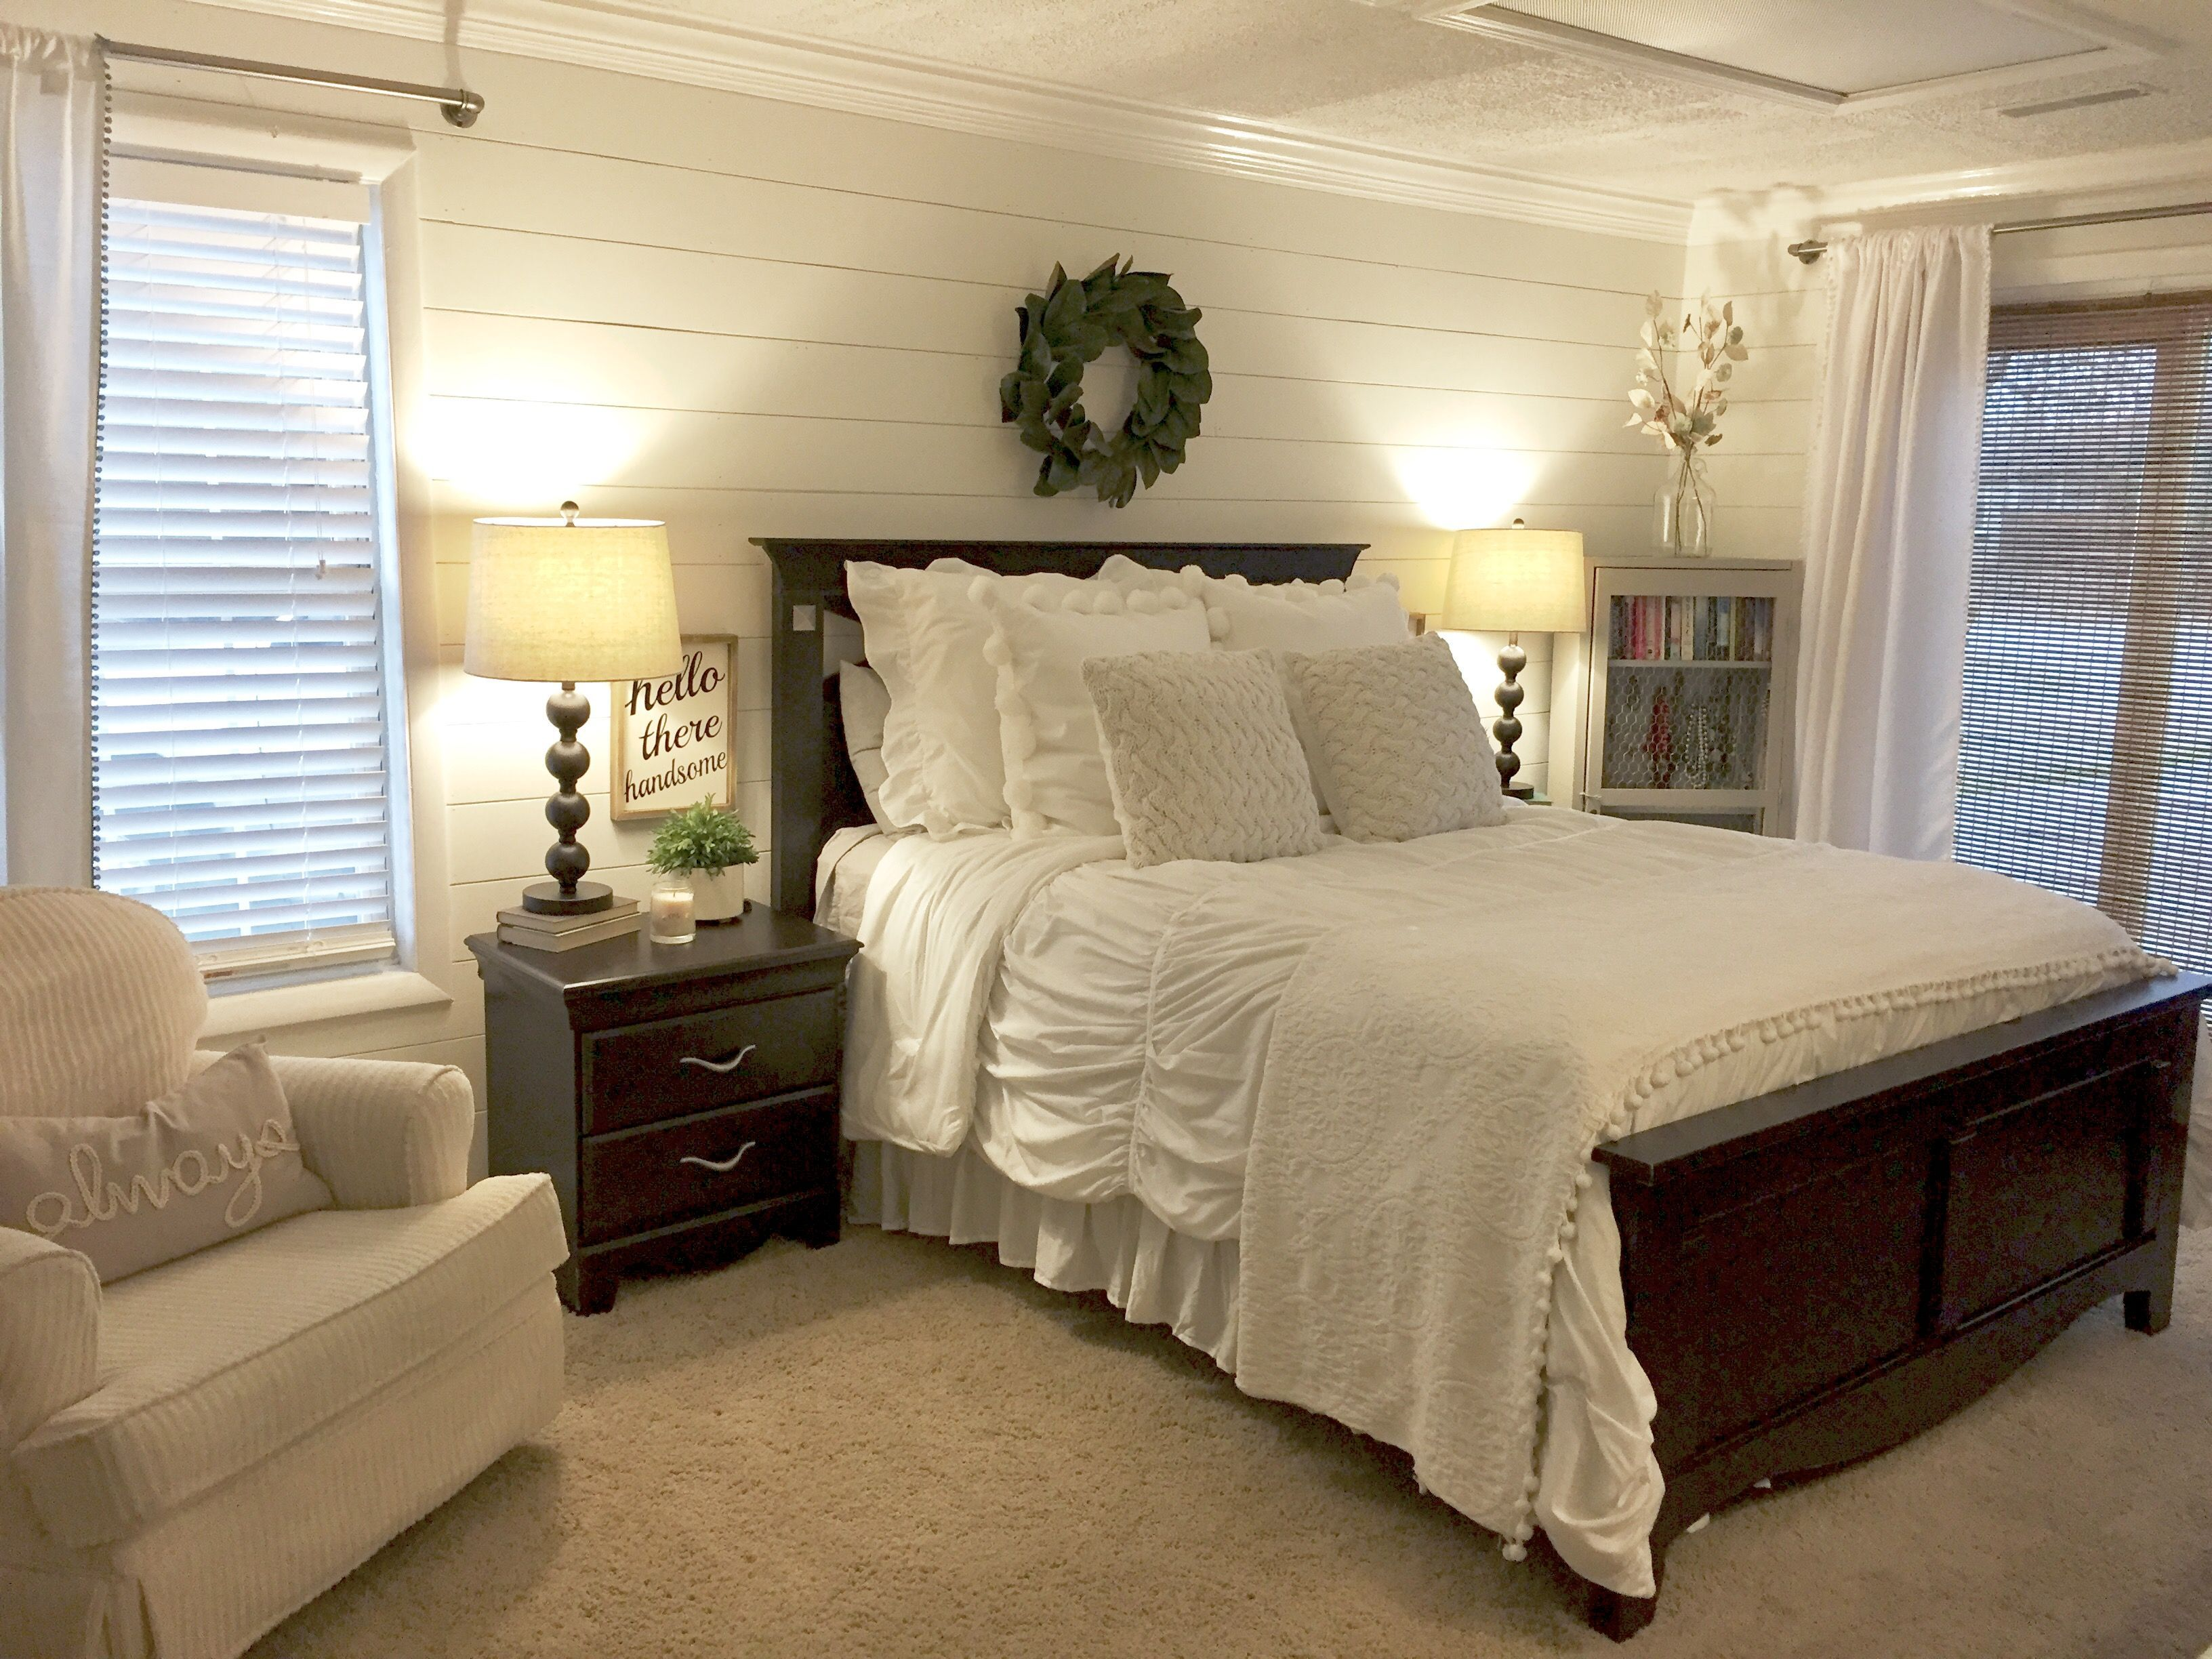 Shiplap Bedroom Walls With Farmhouse Charm... Magnolia